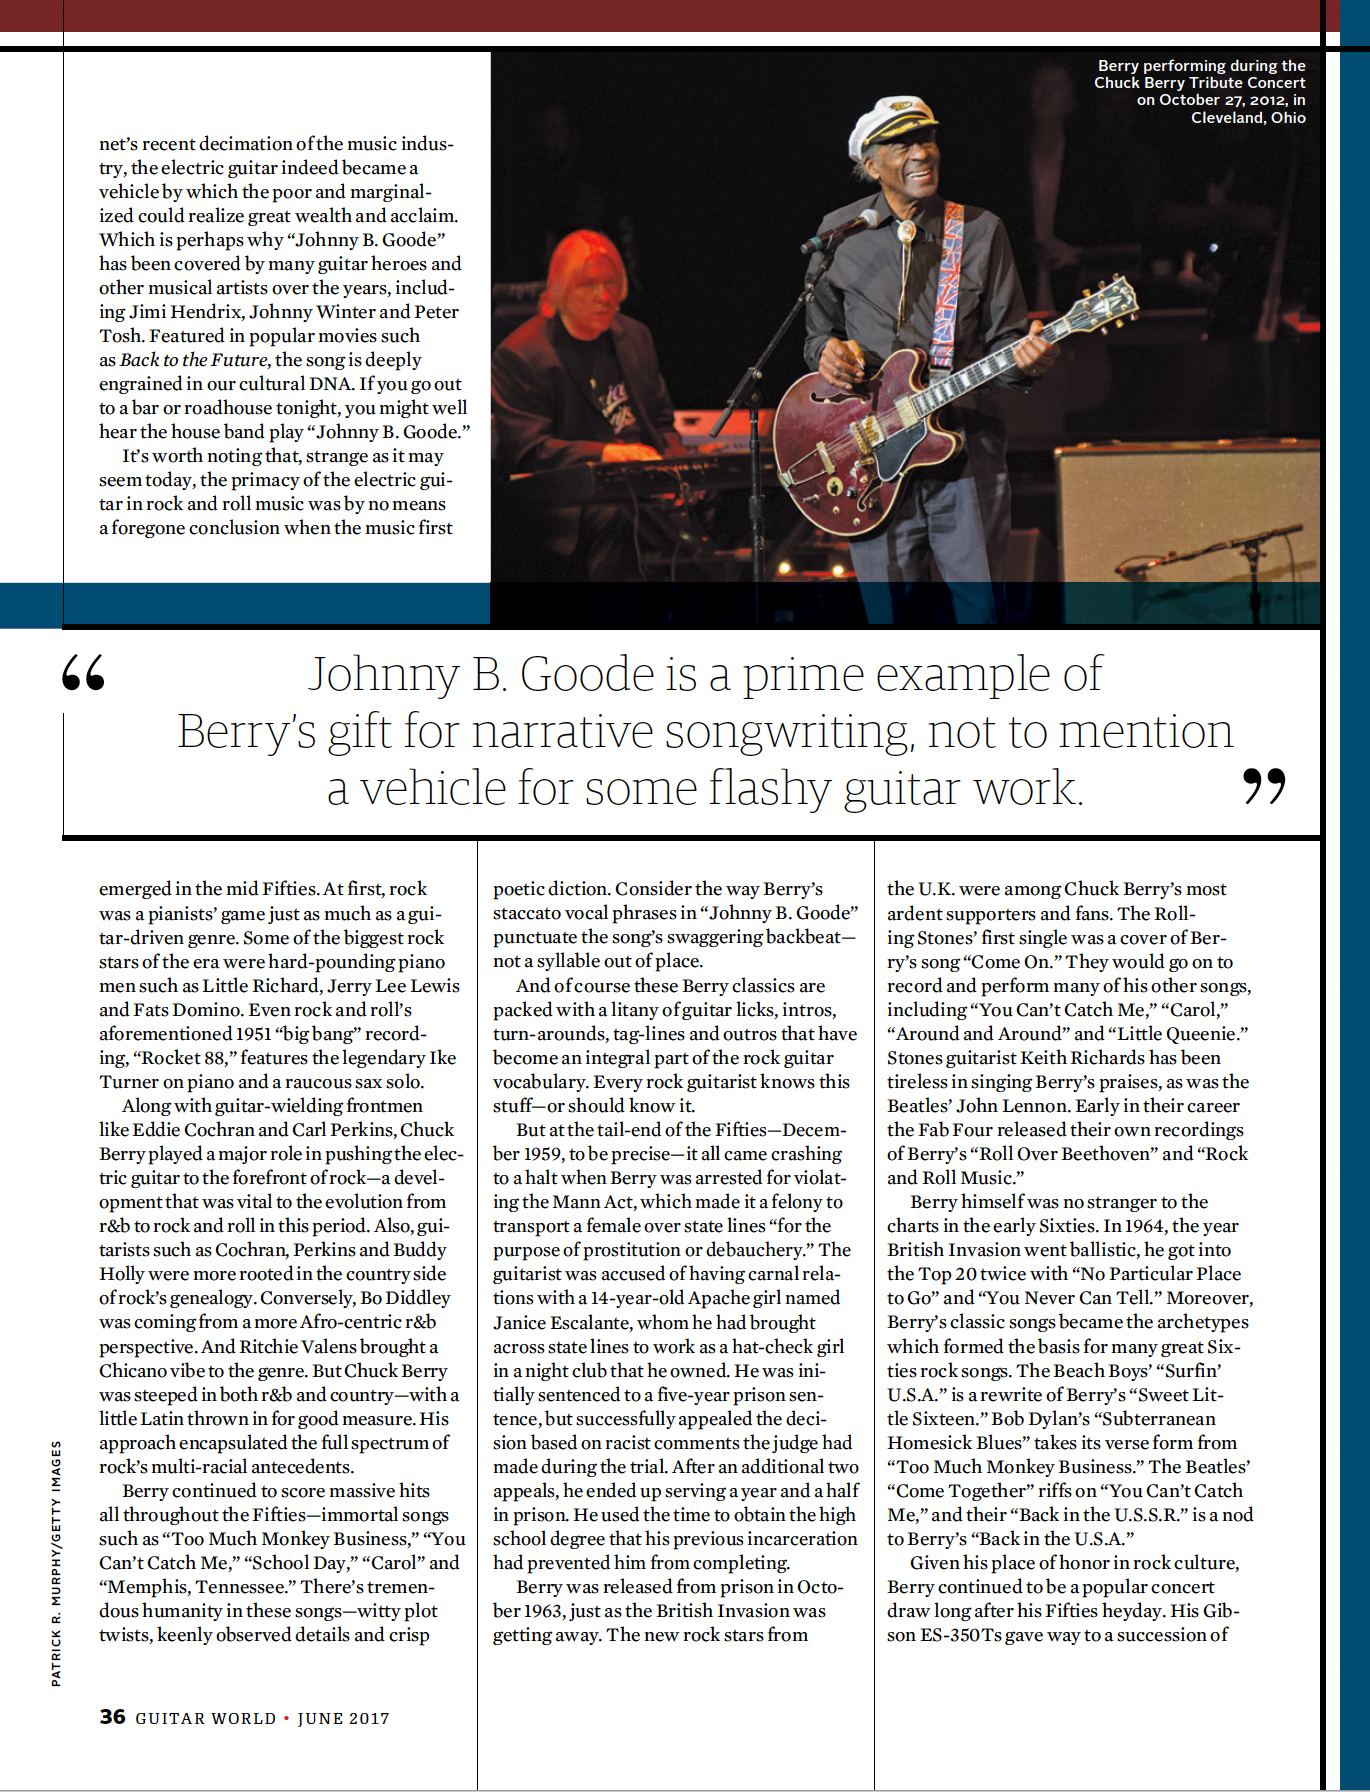 Chuck Berry-Guitar World Magazine